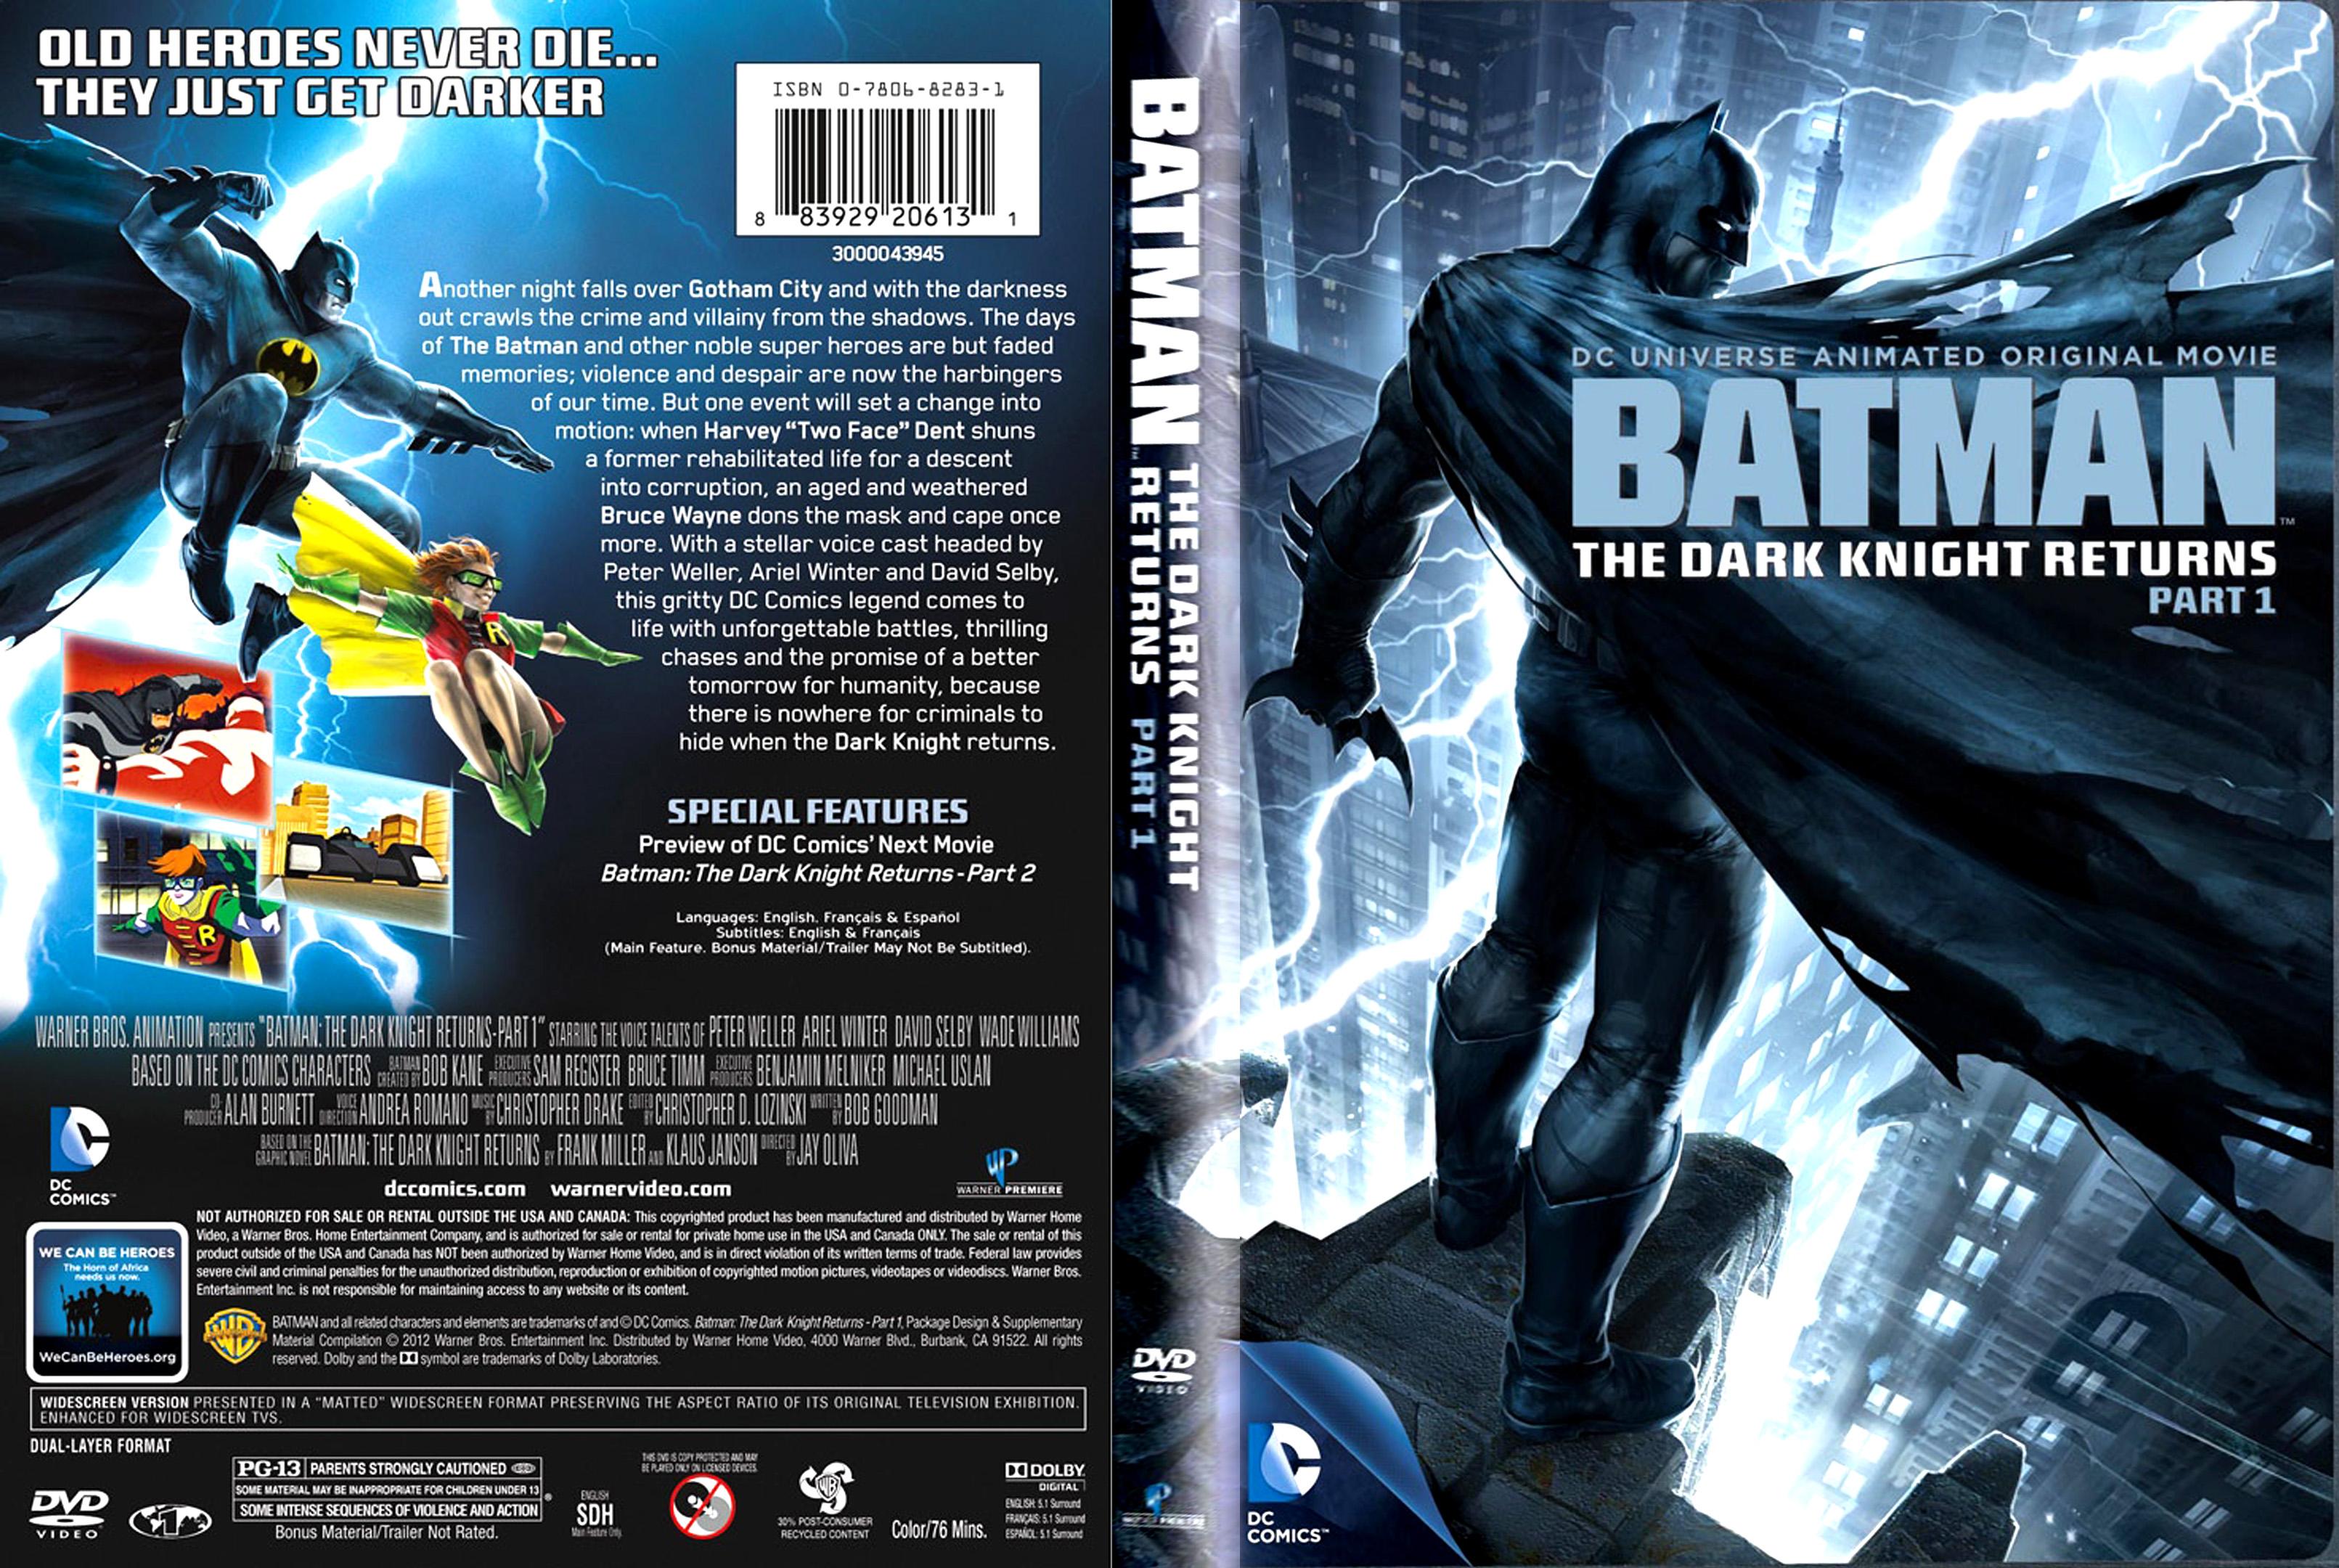 Batman: The Dark Knight Returns, Part 1 (DVD, 2012) for ...